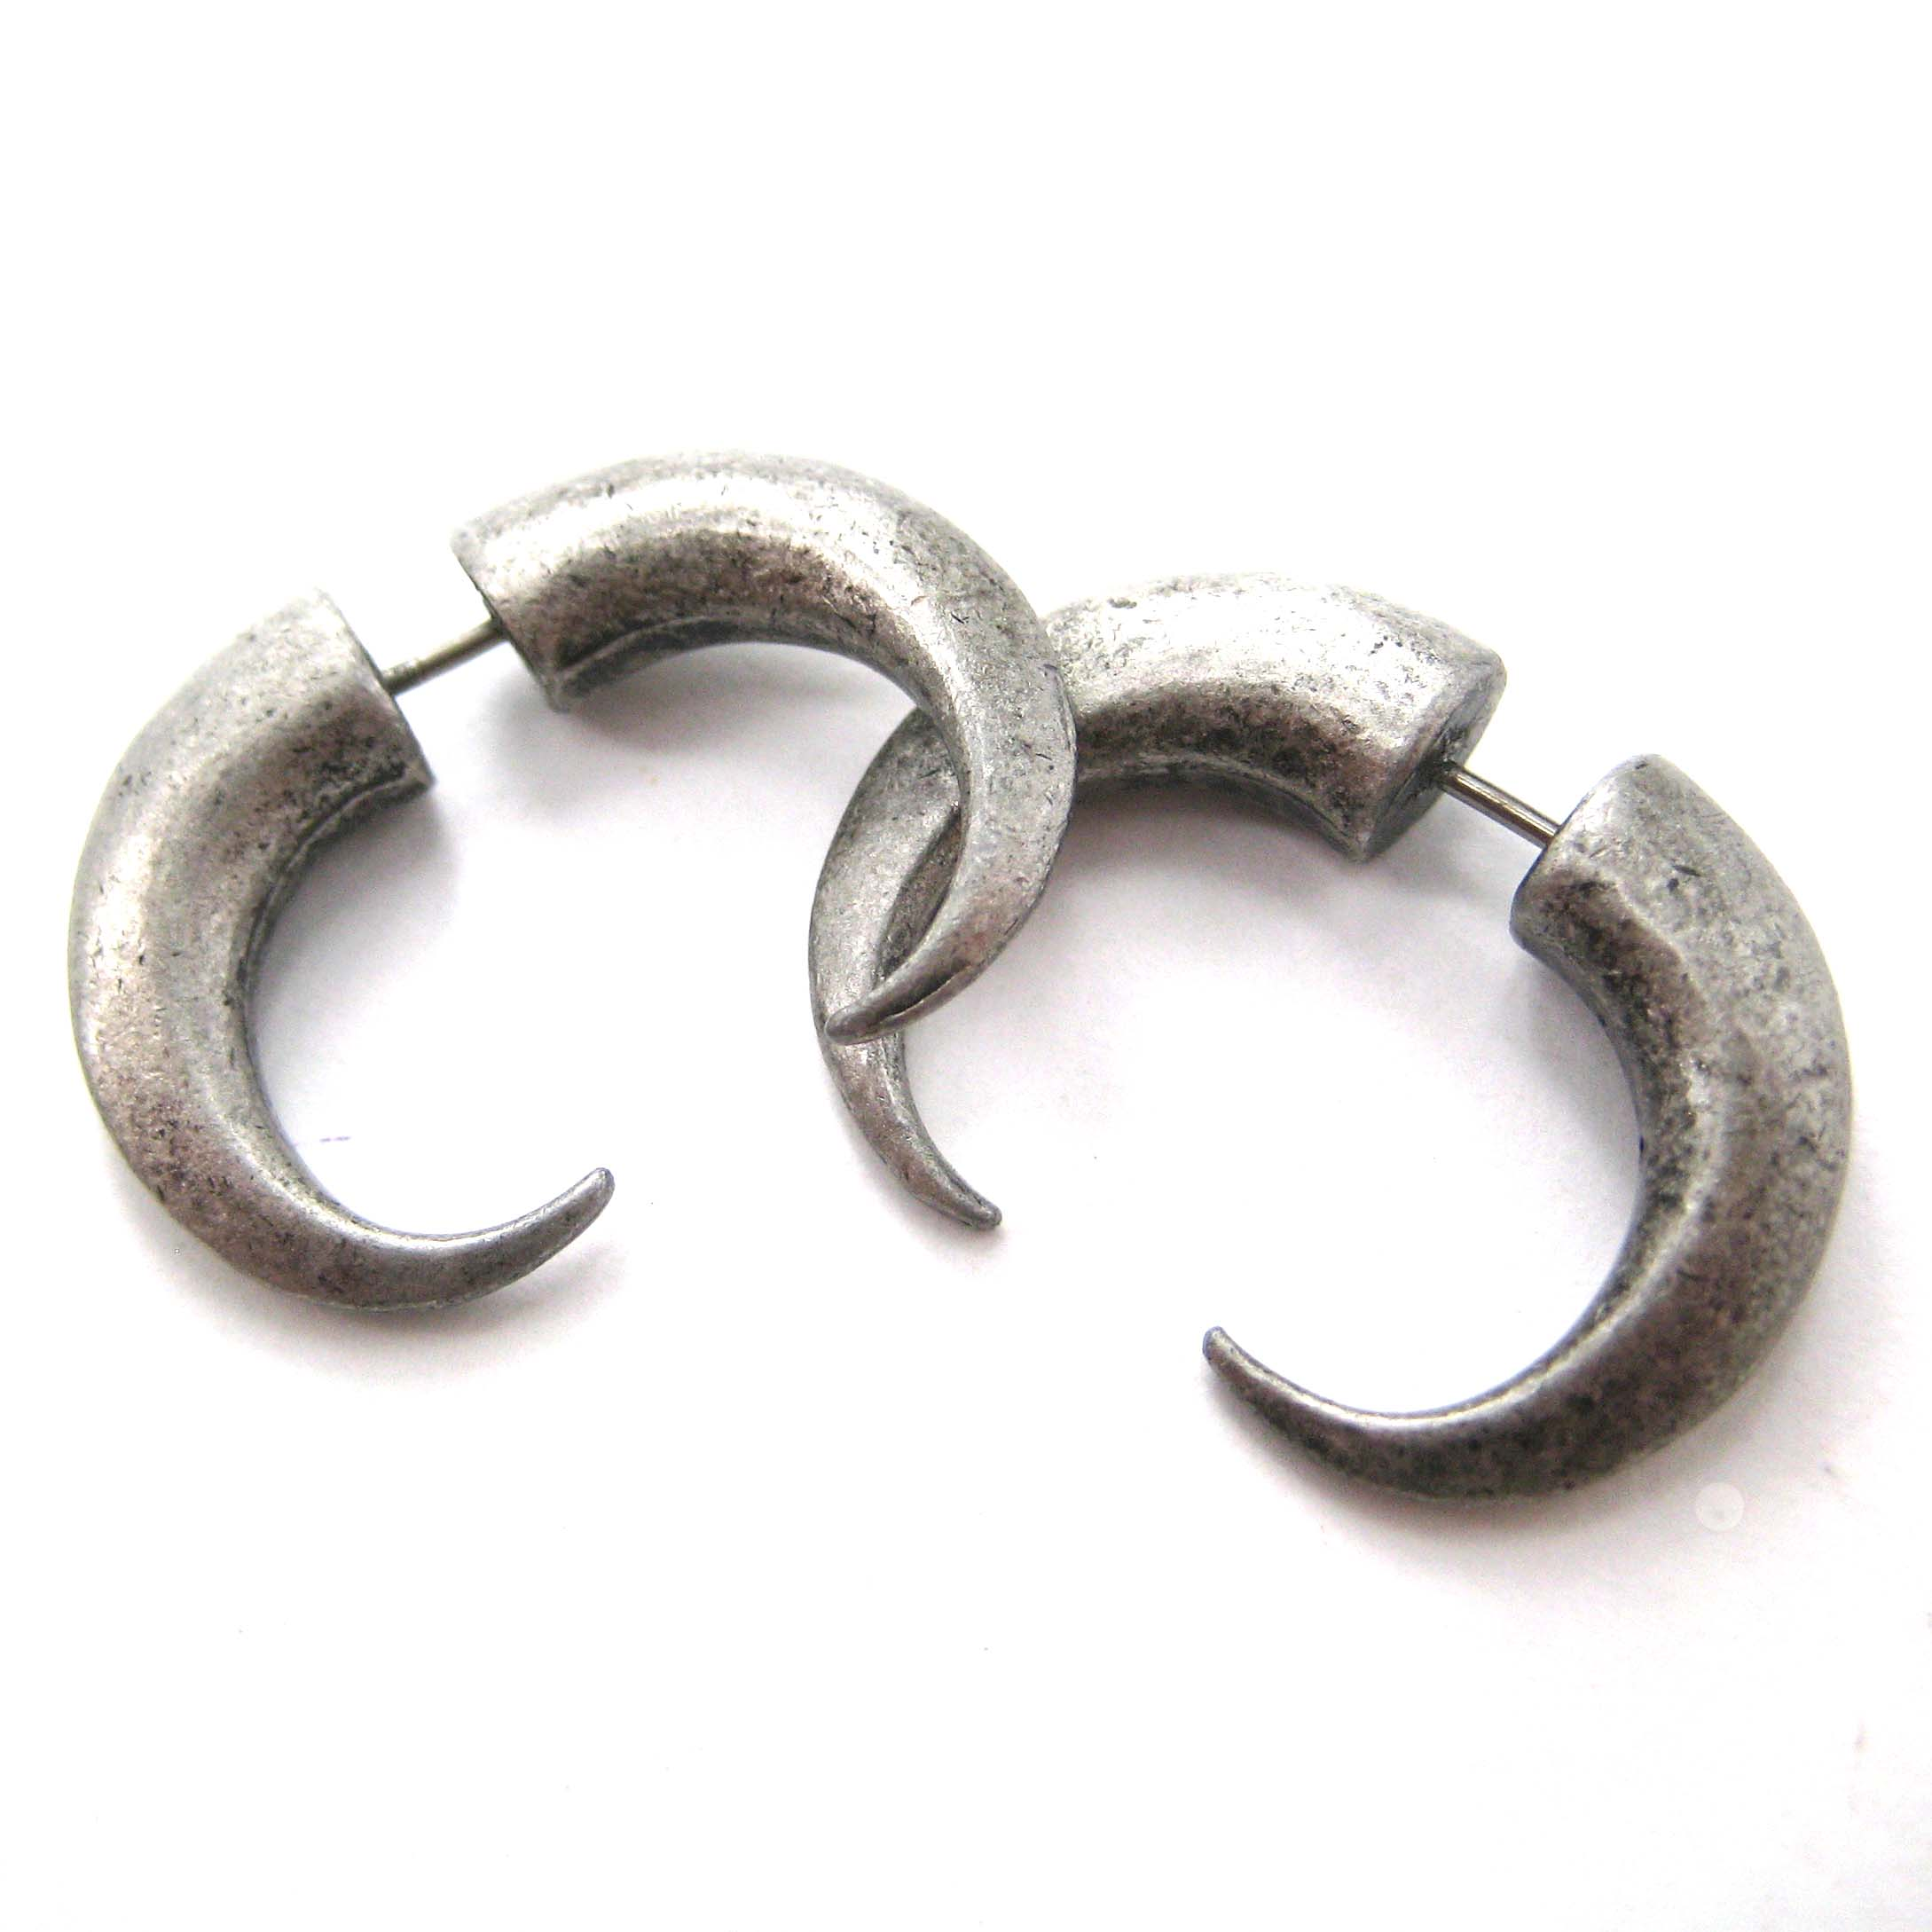 3d Fake Gauge Horn Hook Rocker Chic Spike Stud Earrings Silver   Thumbnail 3